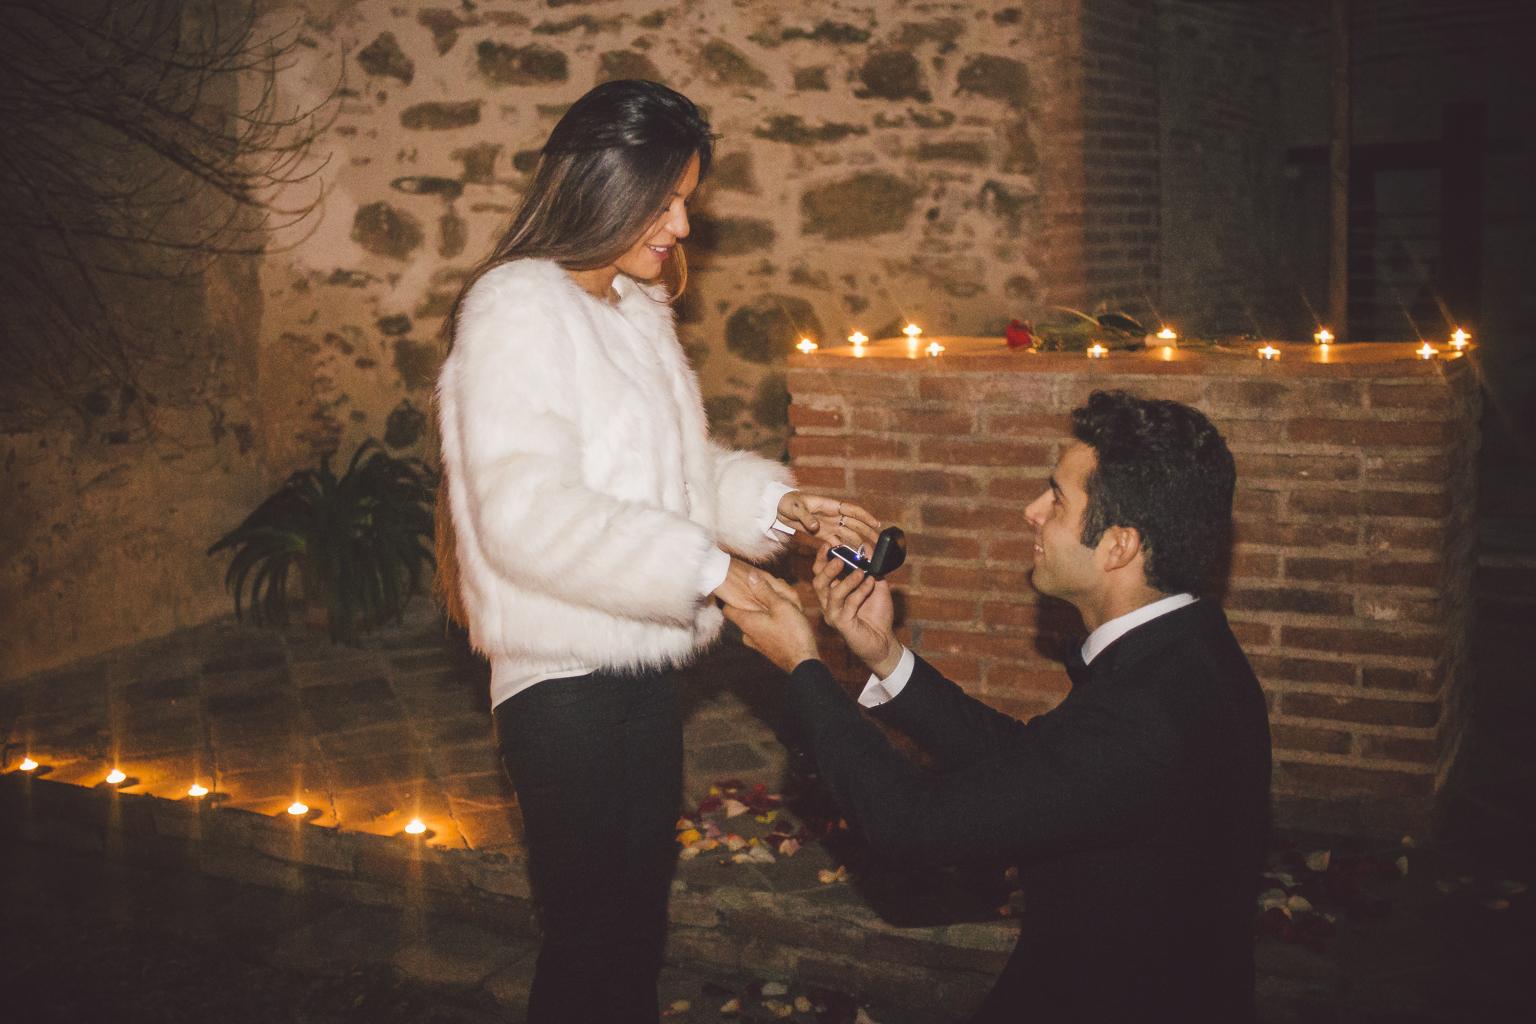 fotografo de bodas barcelona :: pedida de mano sorpresa :: pedida de mano romántica sorpresa :: pedida de manos con velas :: preboda en barcelona